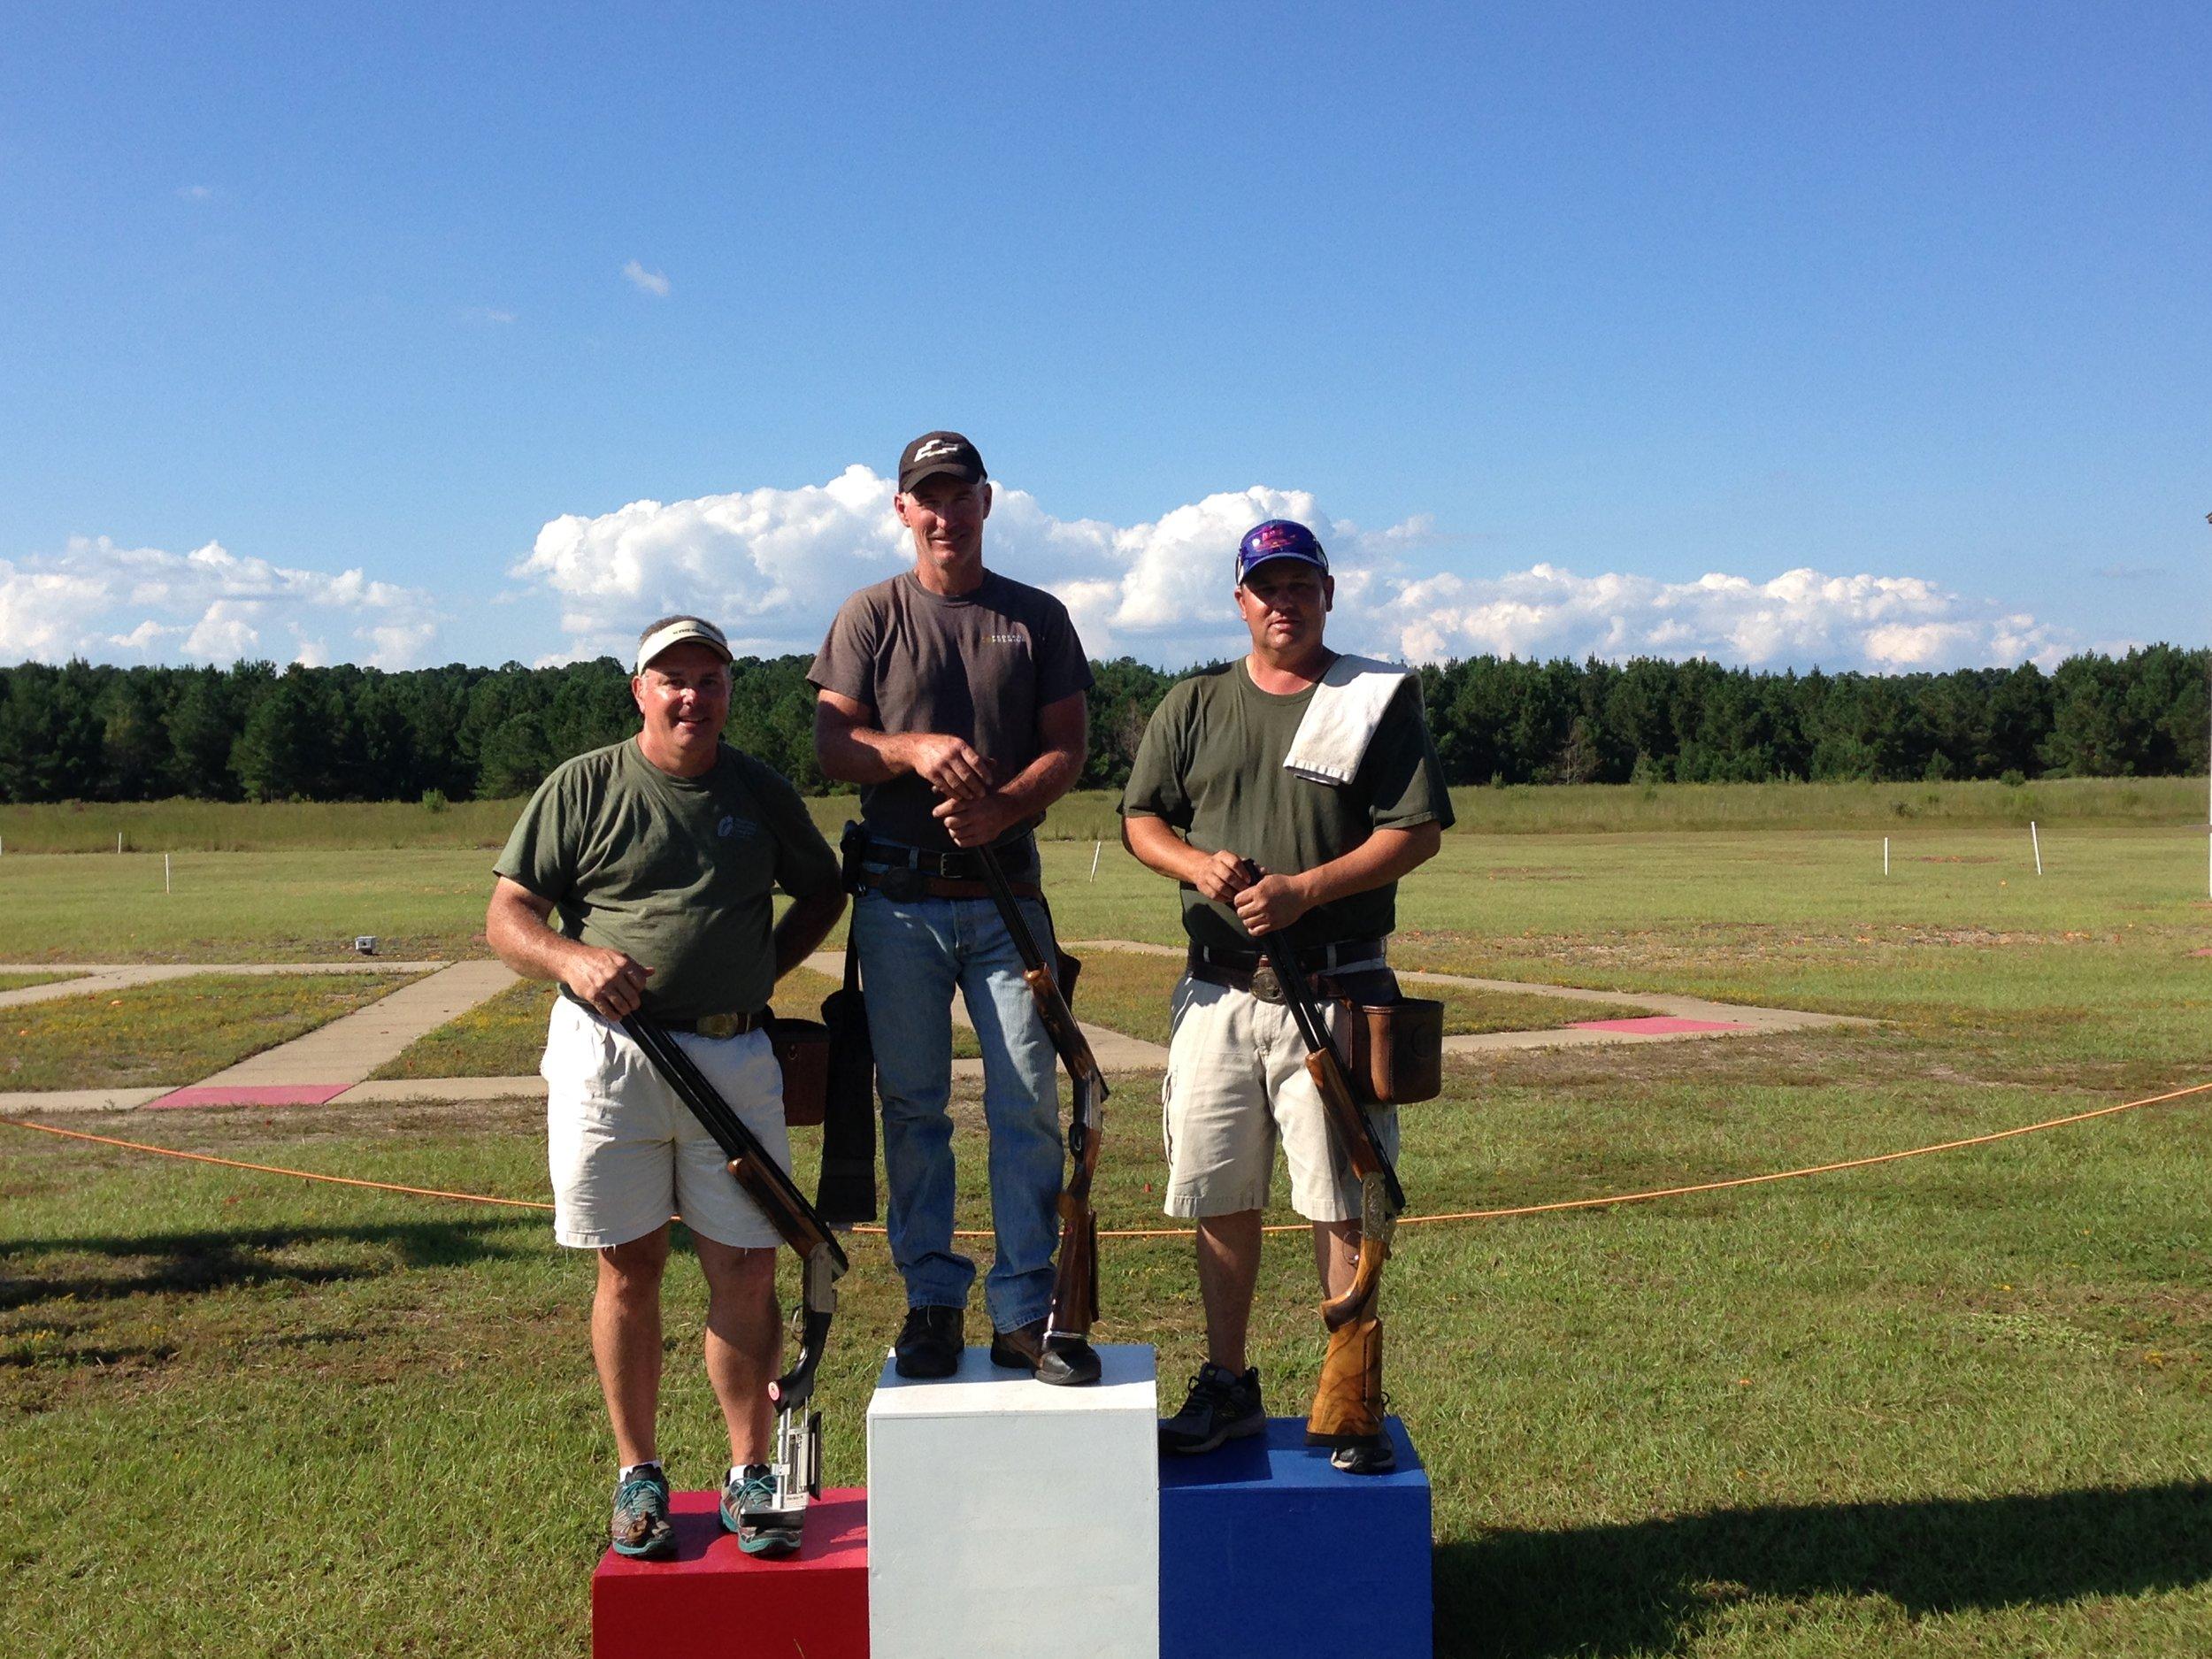 HOA winners: Champion - Stuart Brown (398), Runner-up - Craig Kirkman (397), and 3rd - Chip Simmons (397).